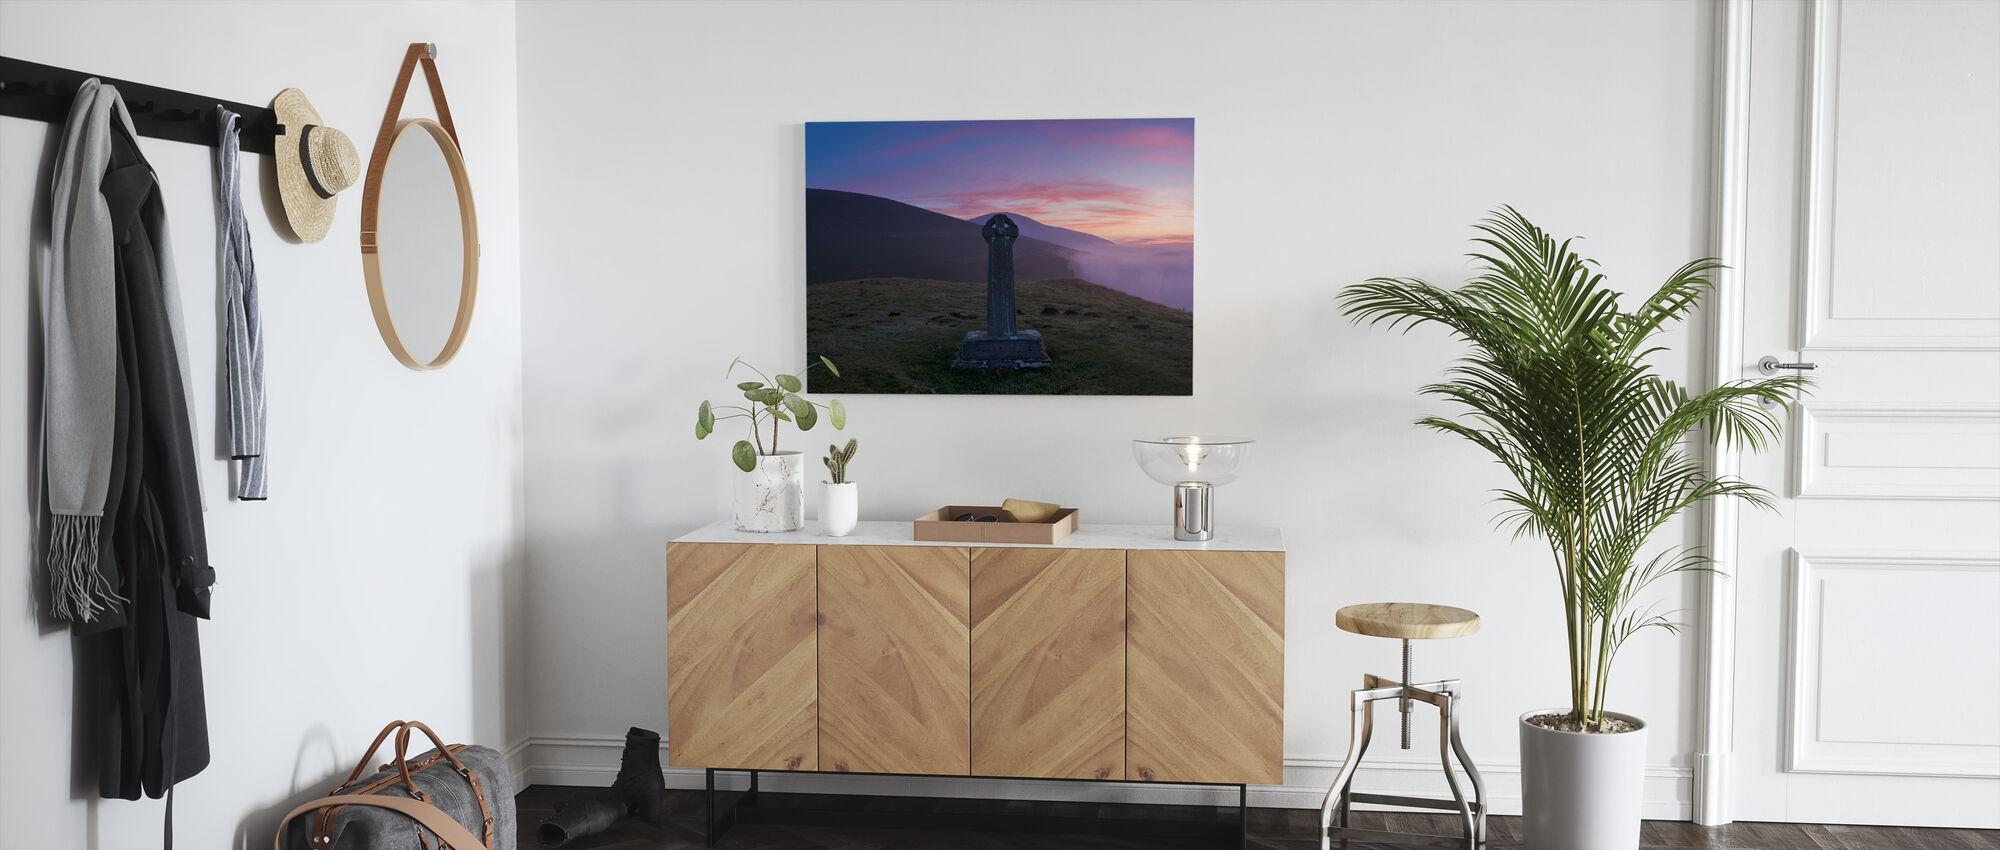 Skiddaw Shepherds Monument - Canvas print - Hallway